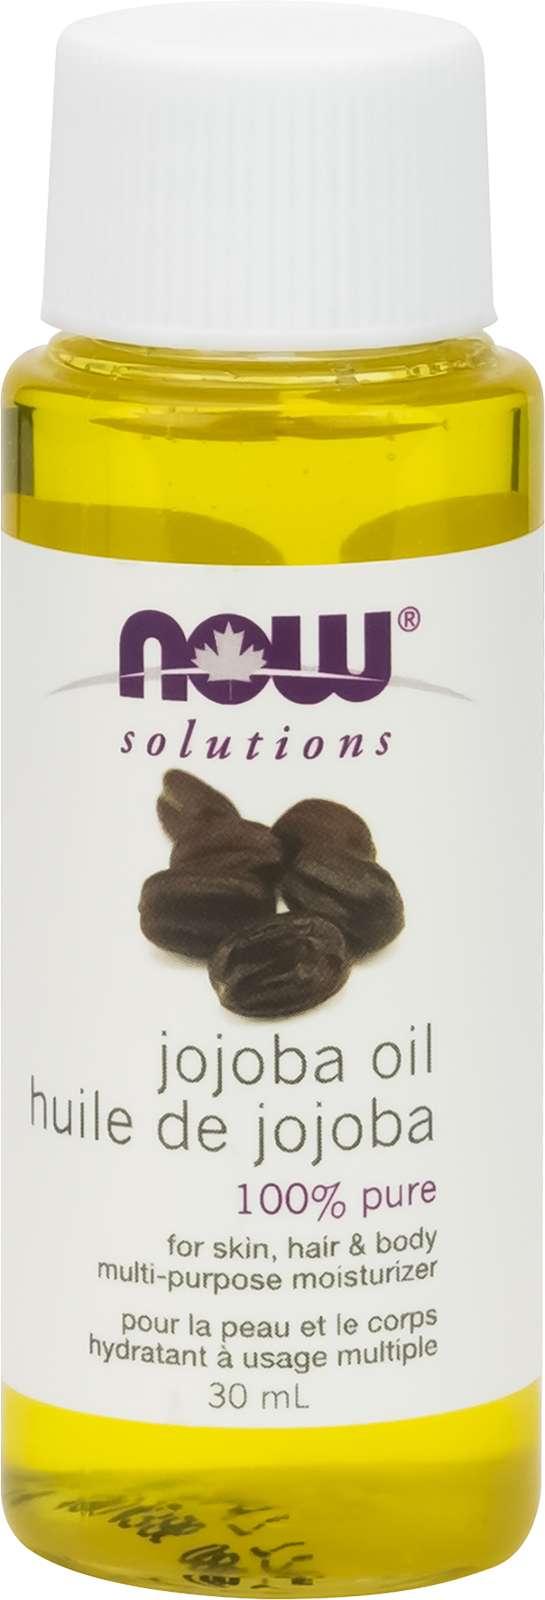 Jojoba Oil, Pure, Expeller Pressed